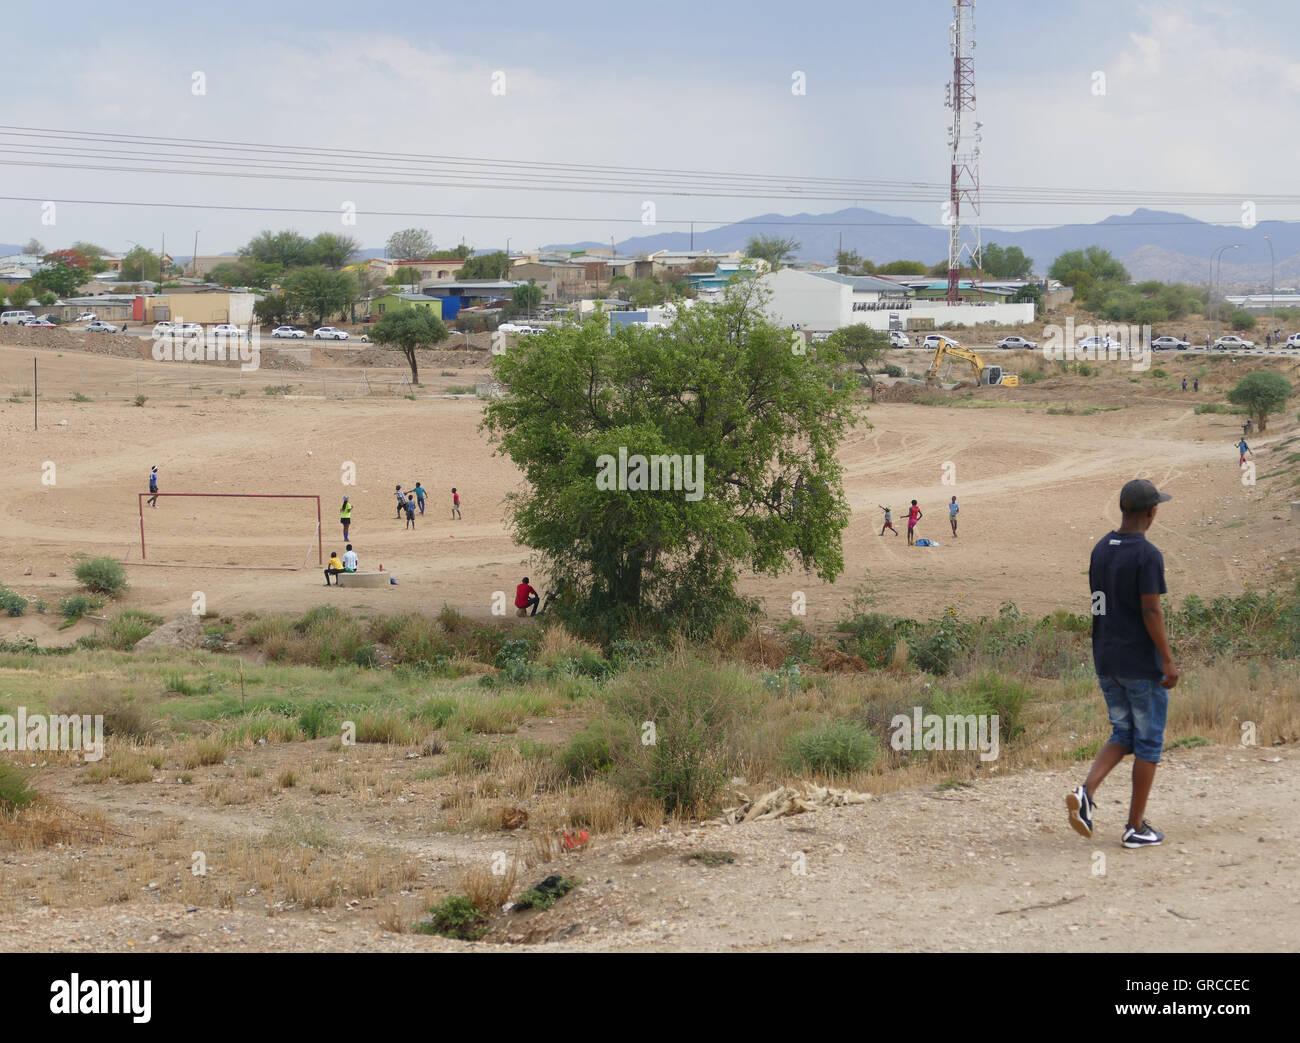 Football Ground, Soccer Unites - Stock Image